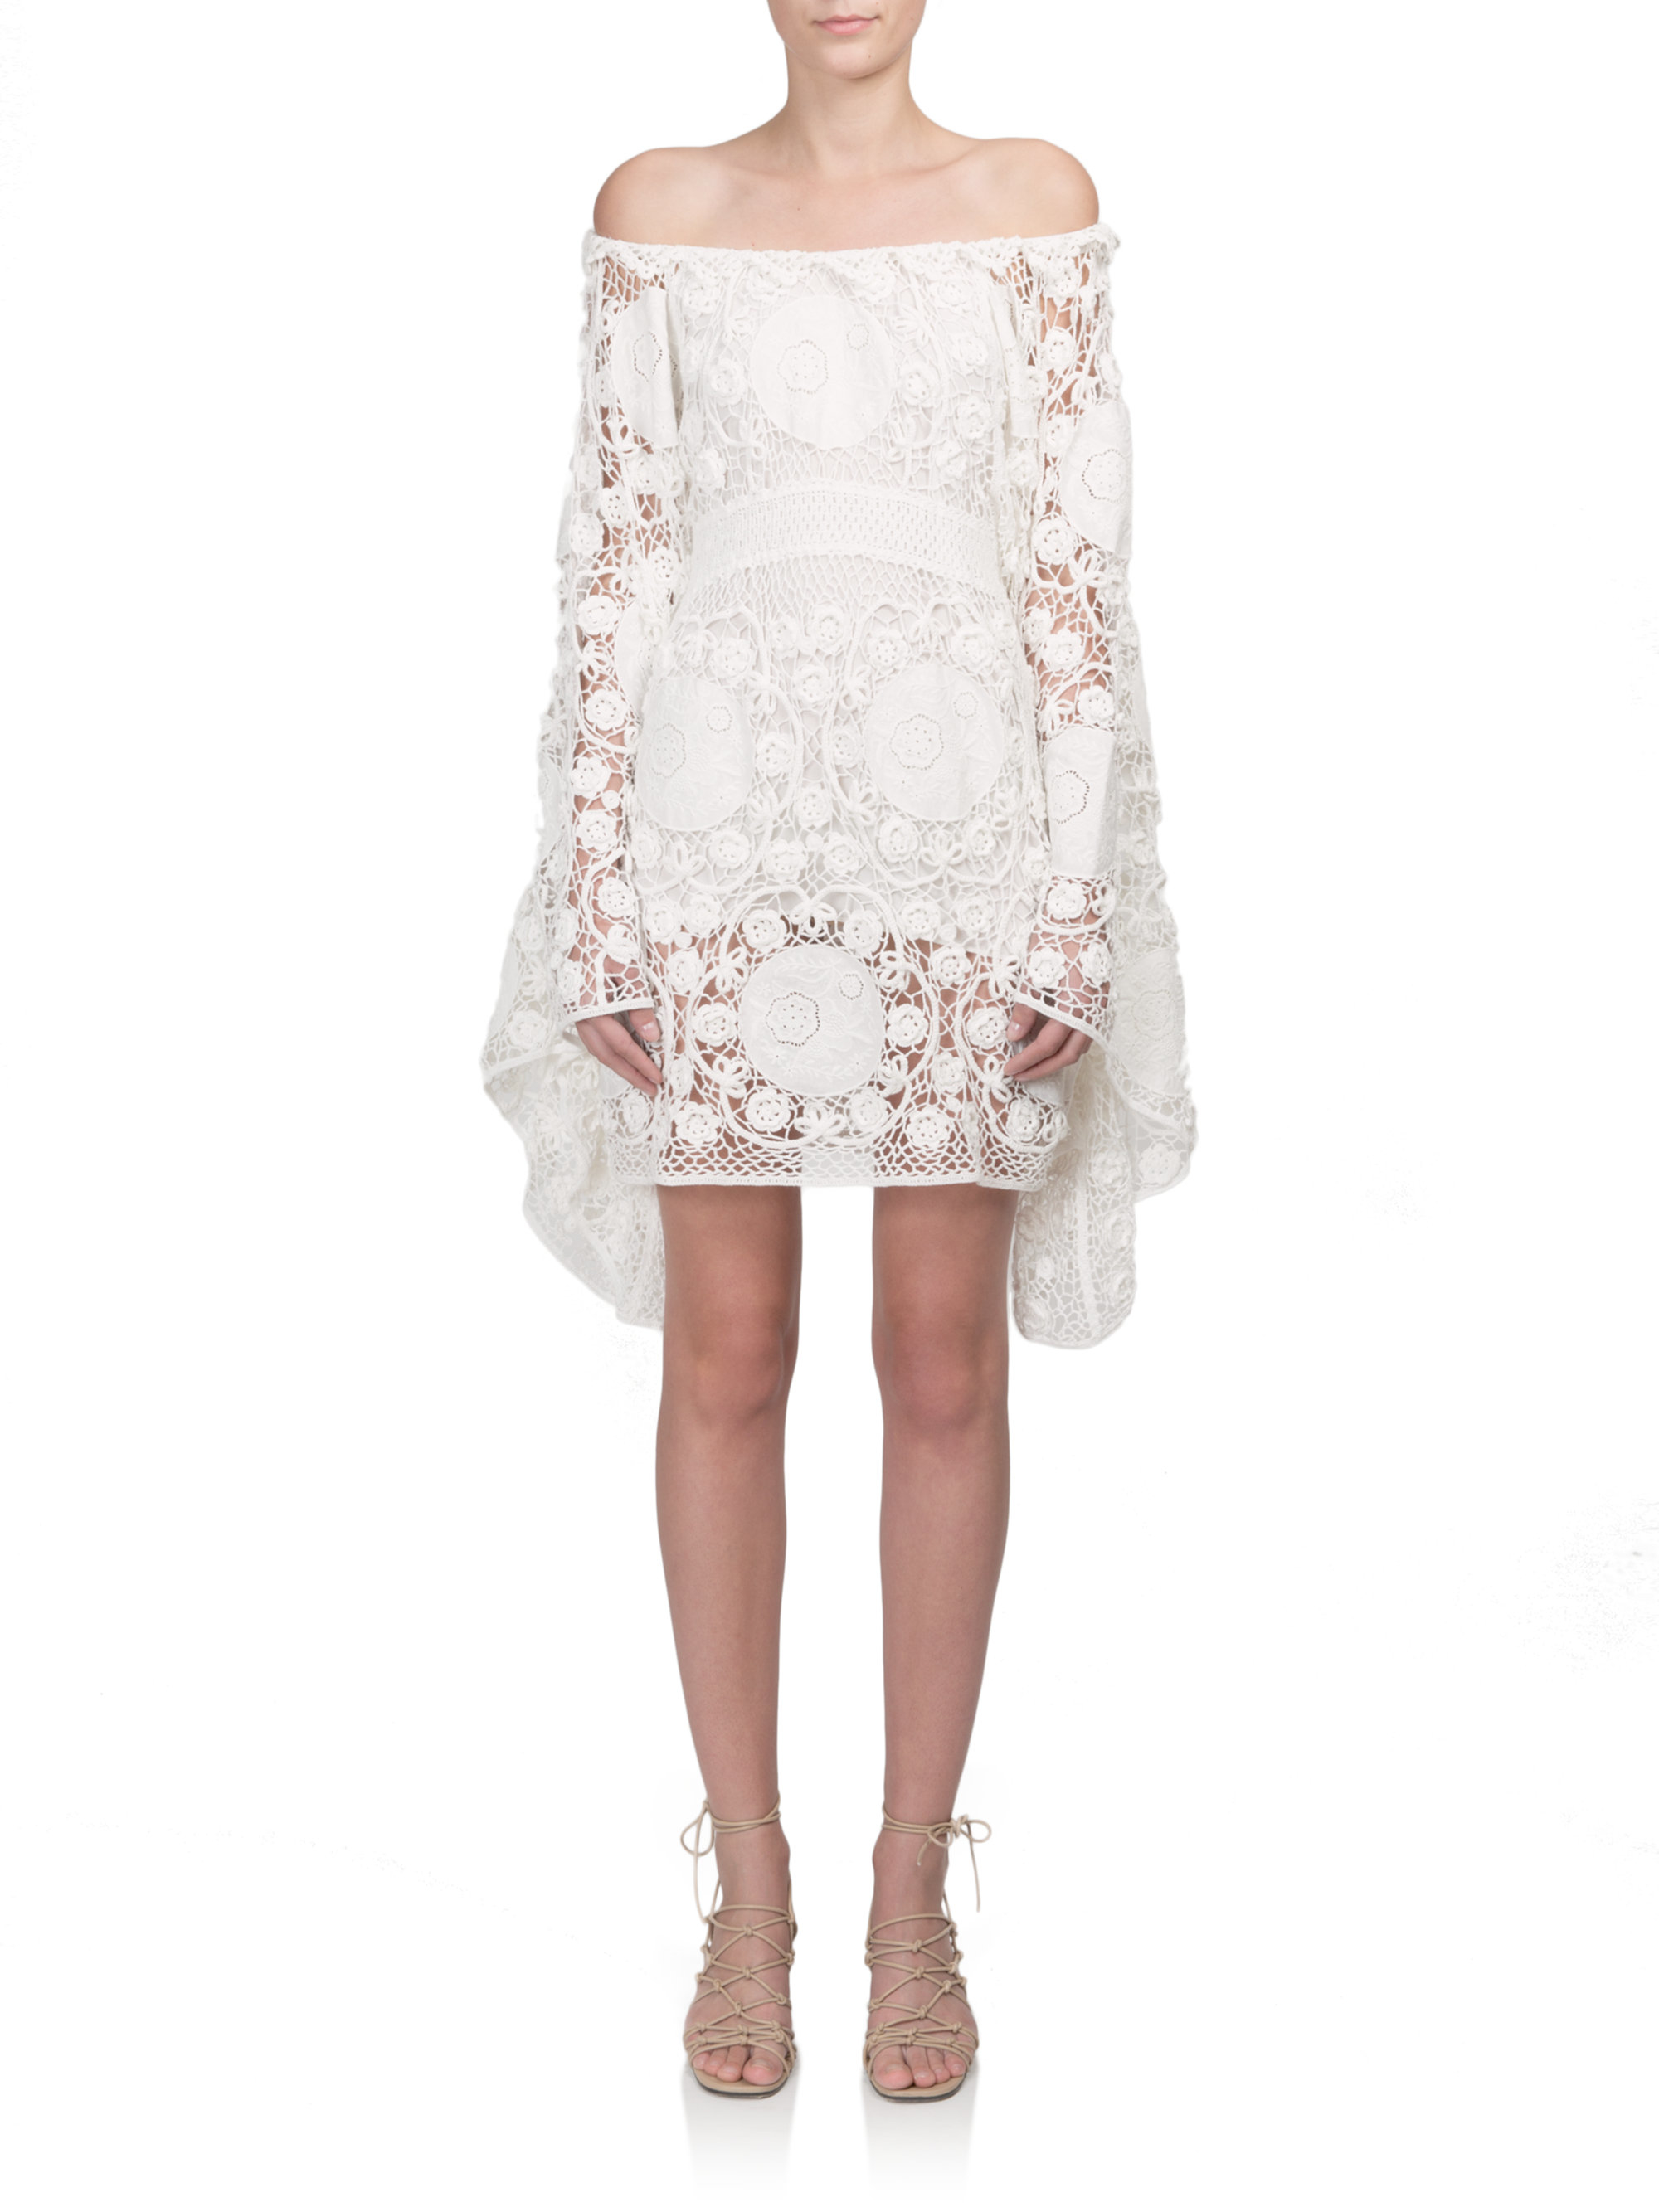 Chloé Off The Shoulder Crochet Dress In White Lyst